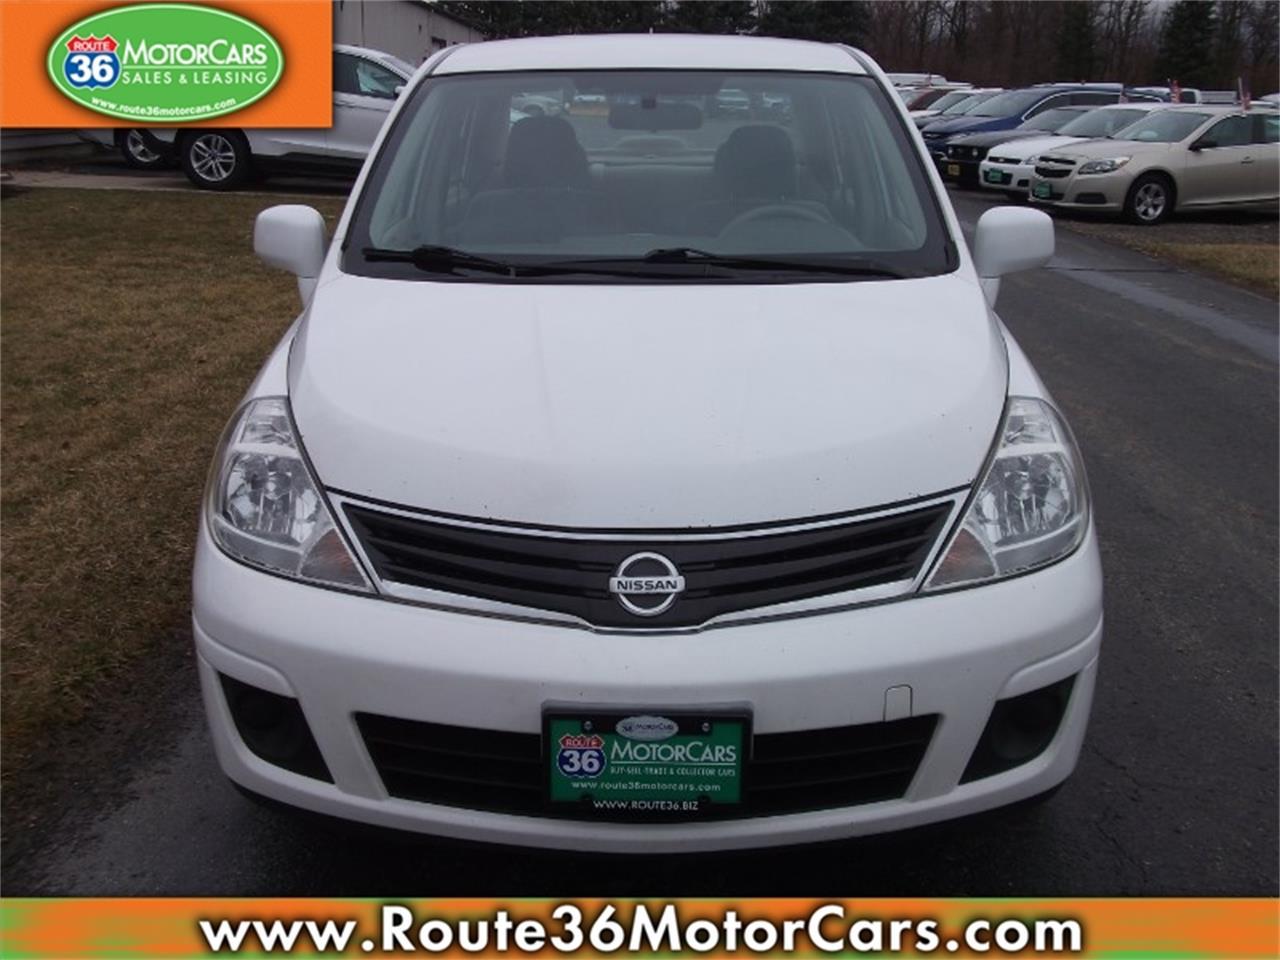 2010 Nissan Versa (CC-1194154) for sale in Dublin, Ohio